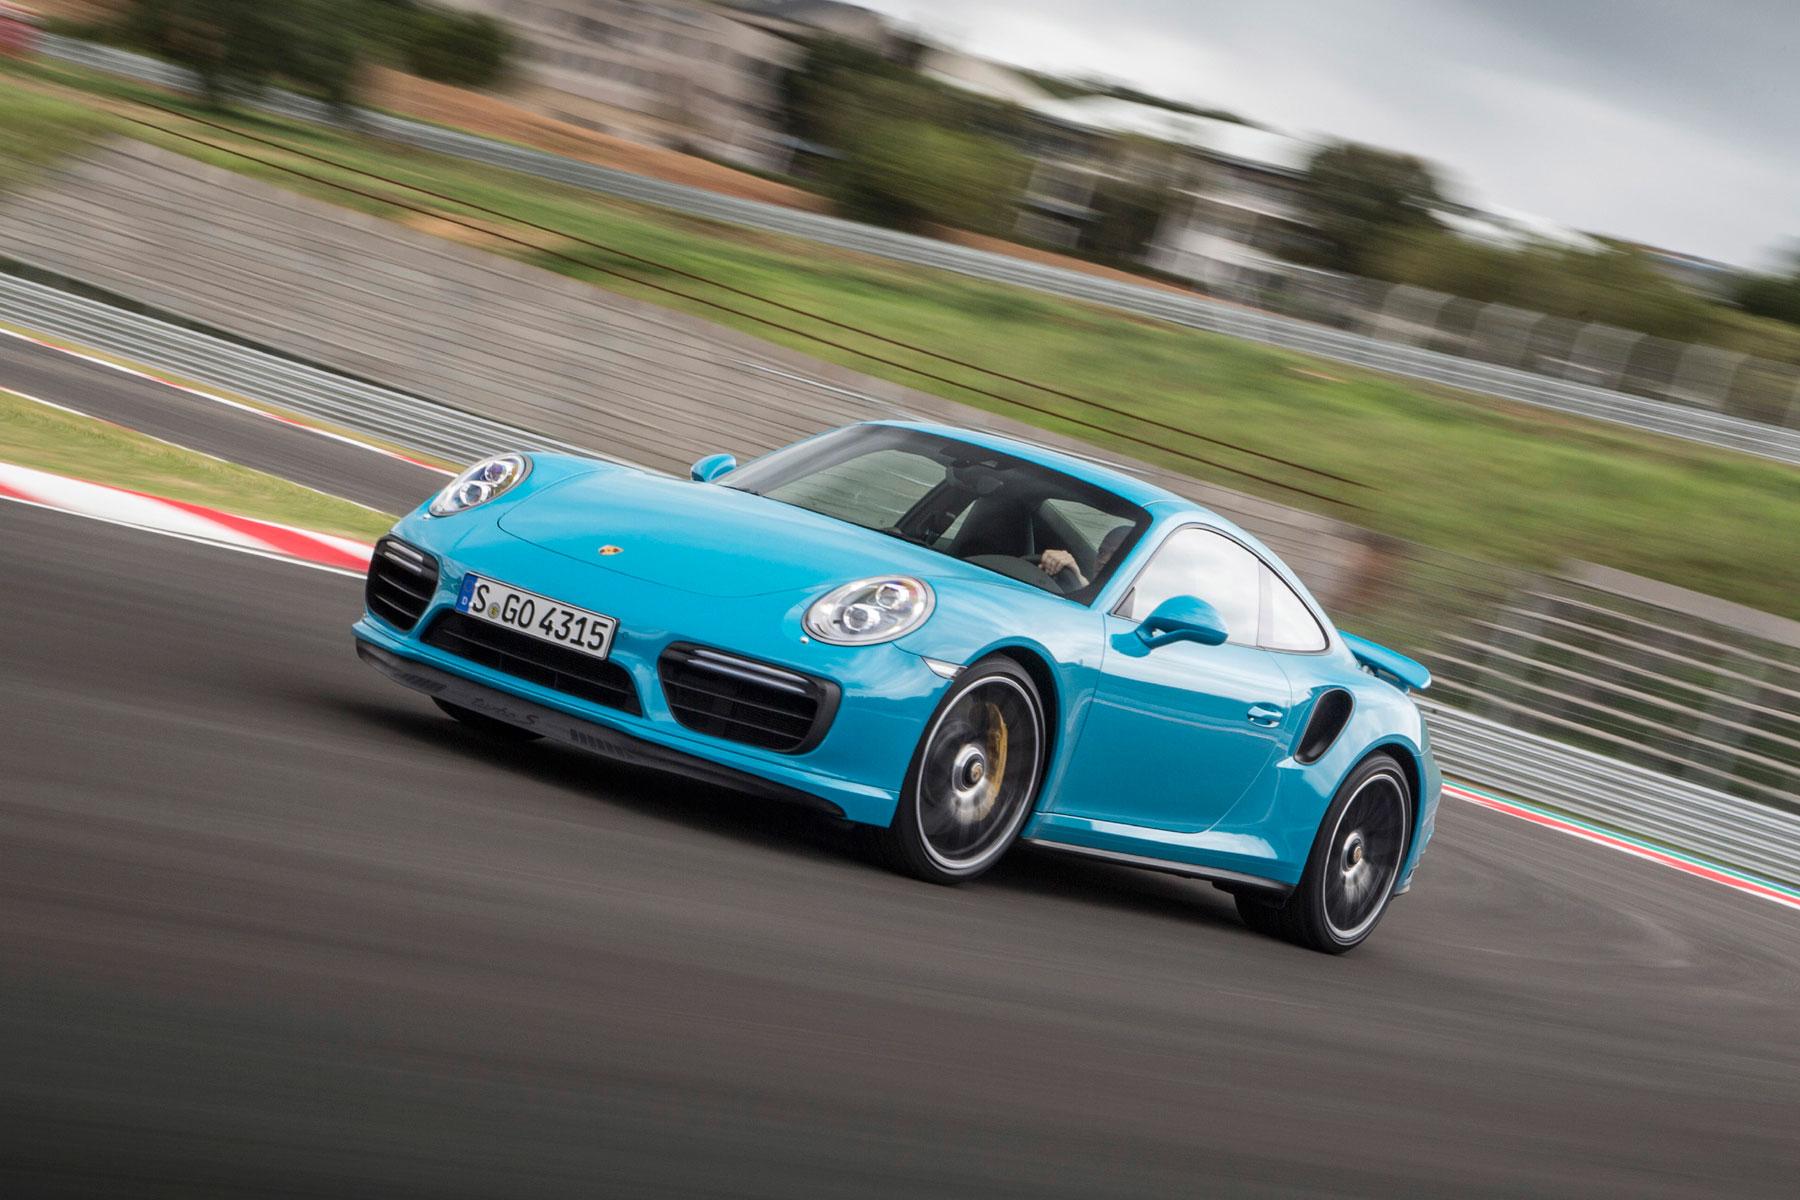 Porsche 911 Turbo S – 2.9 seconds